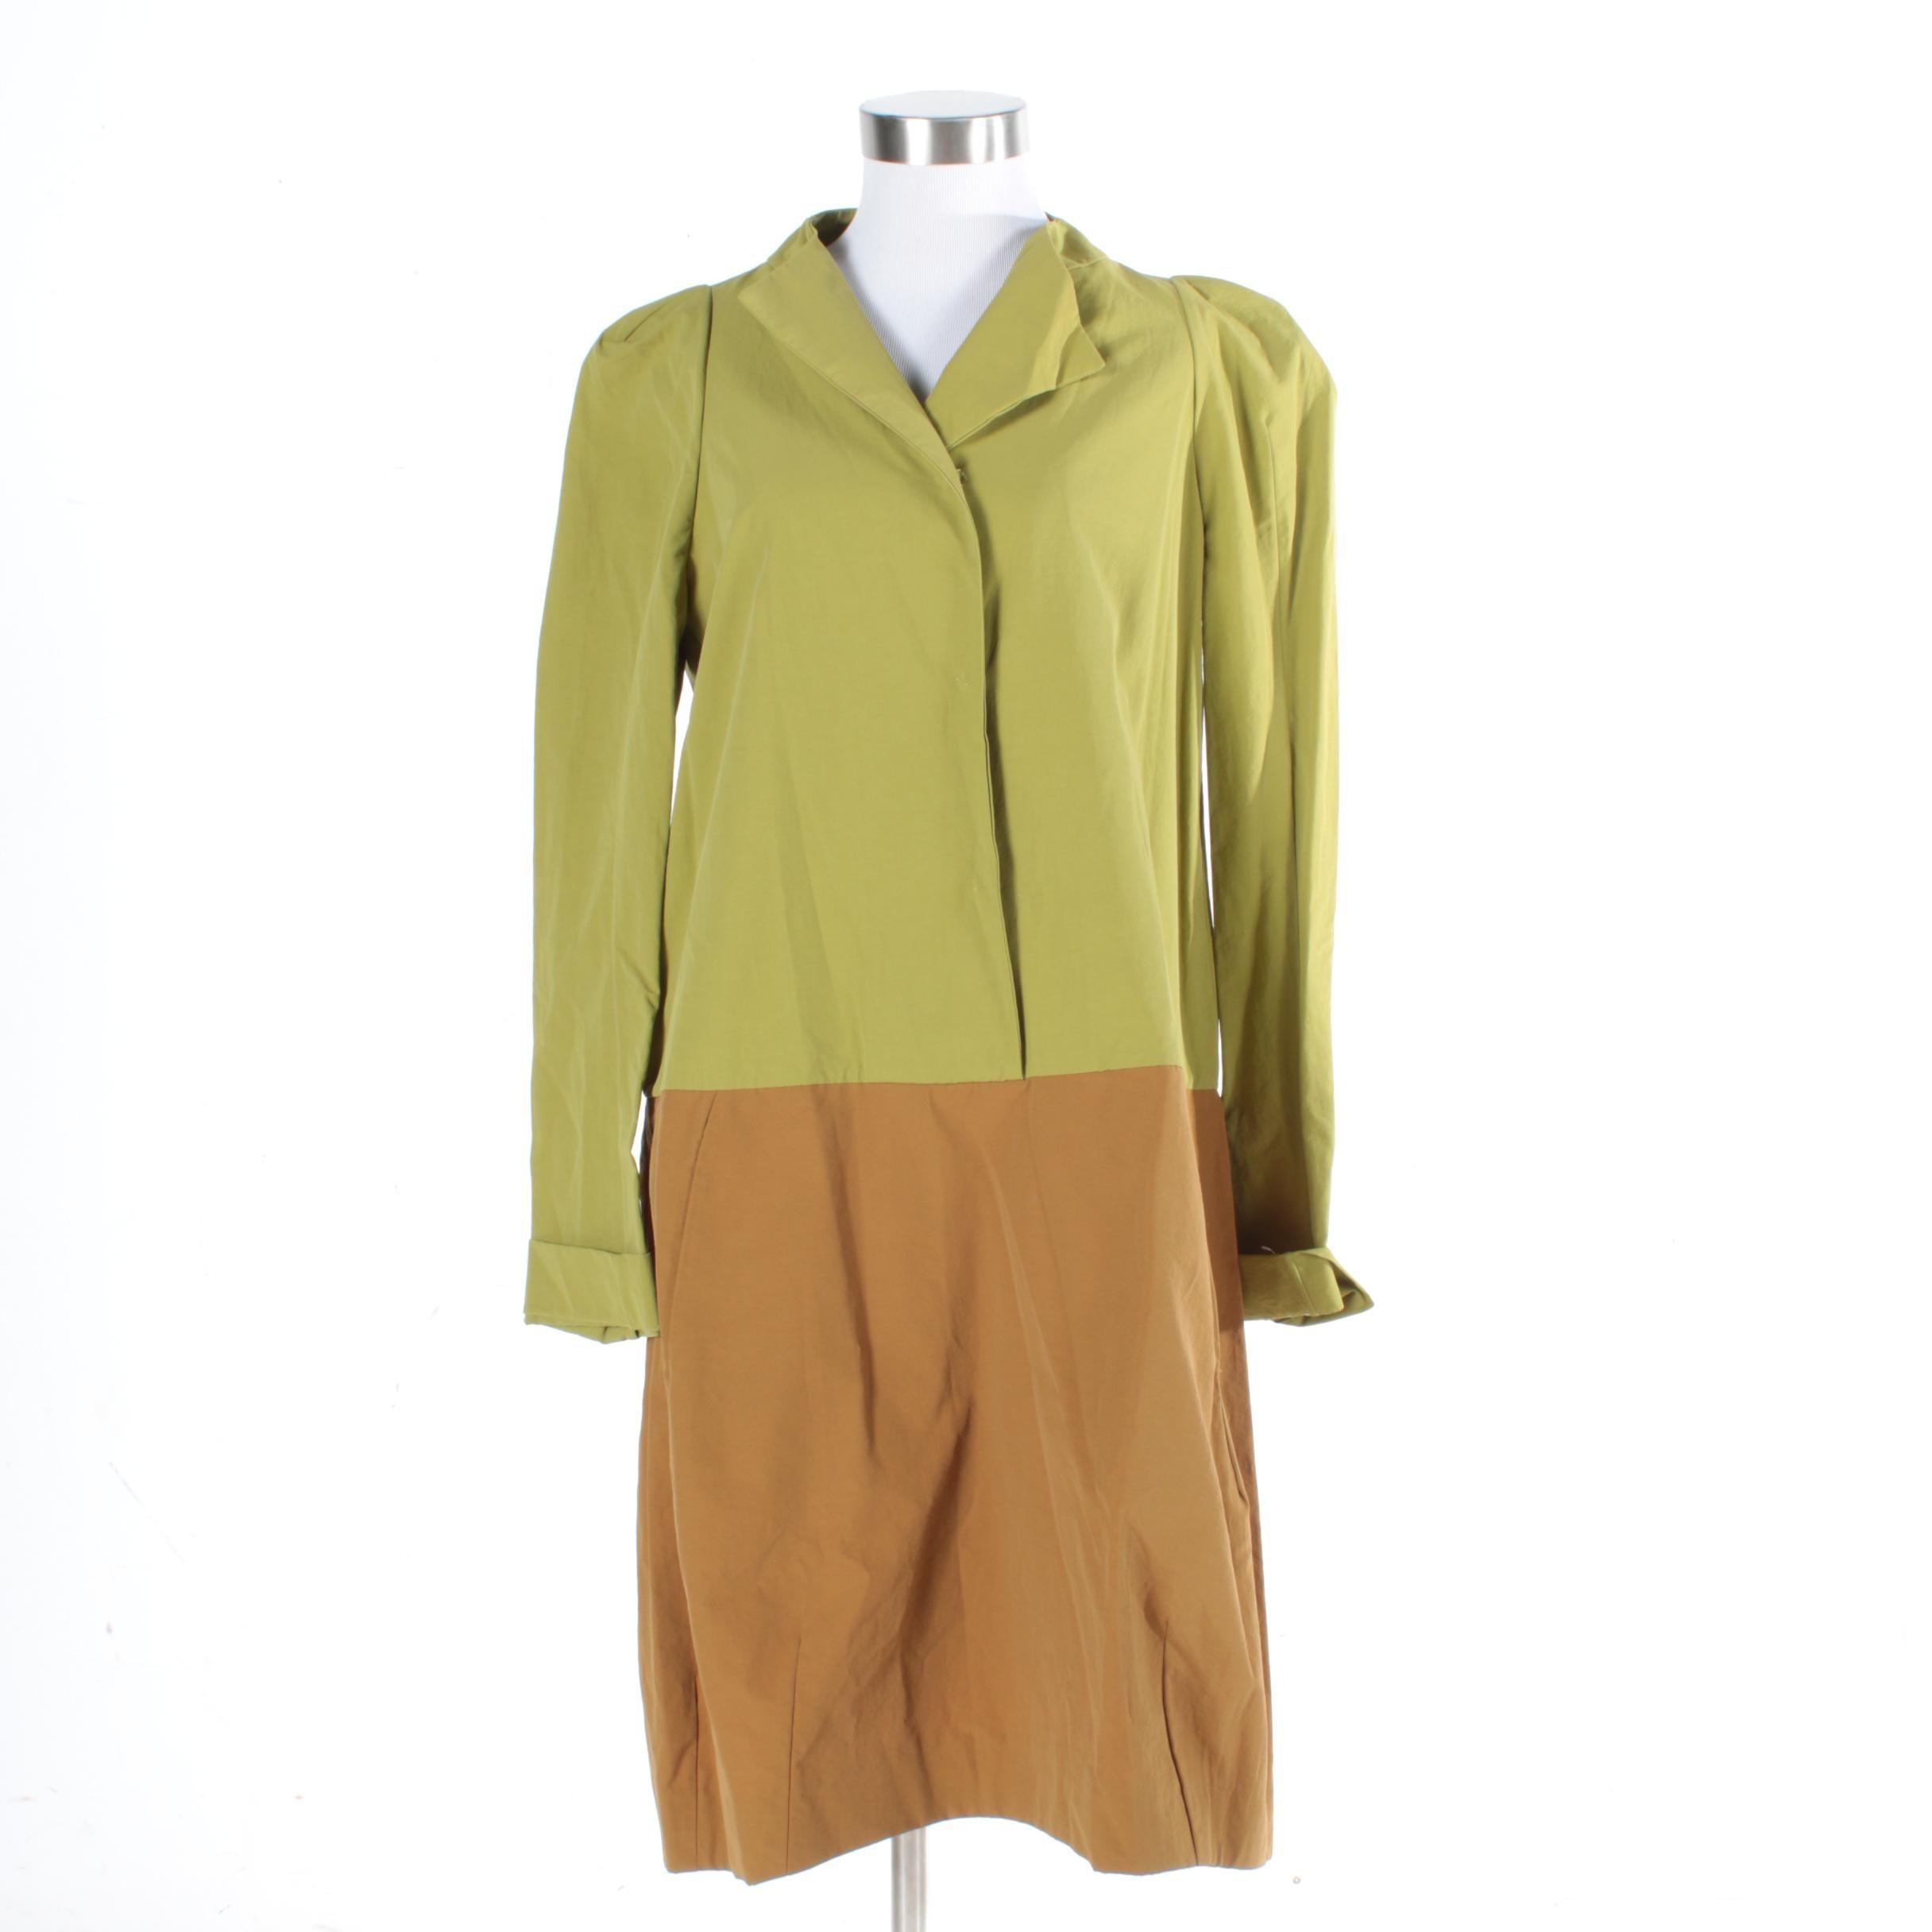 Marni Green and Brown Color Block Shift Dress